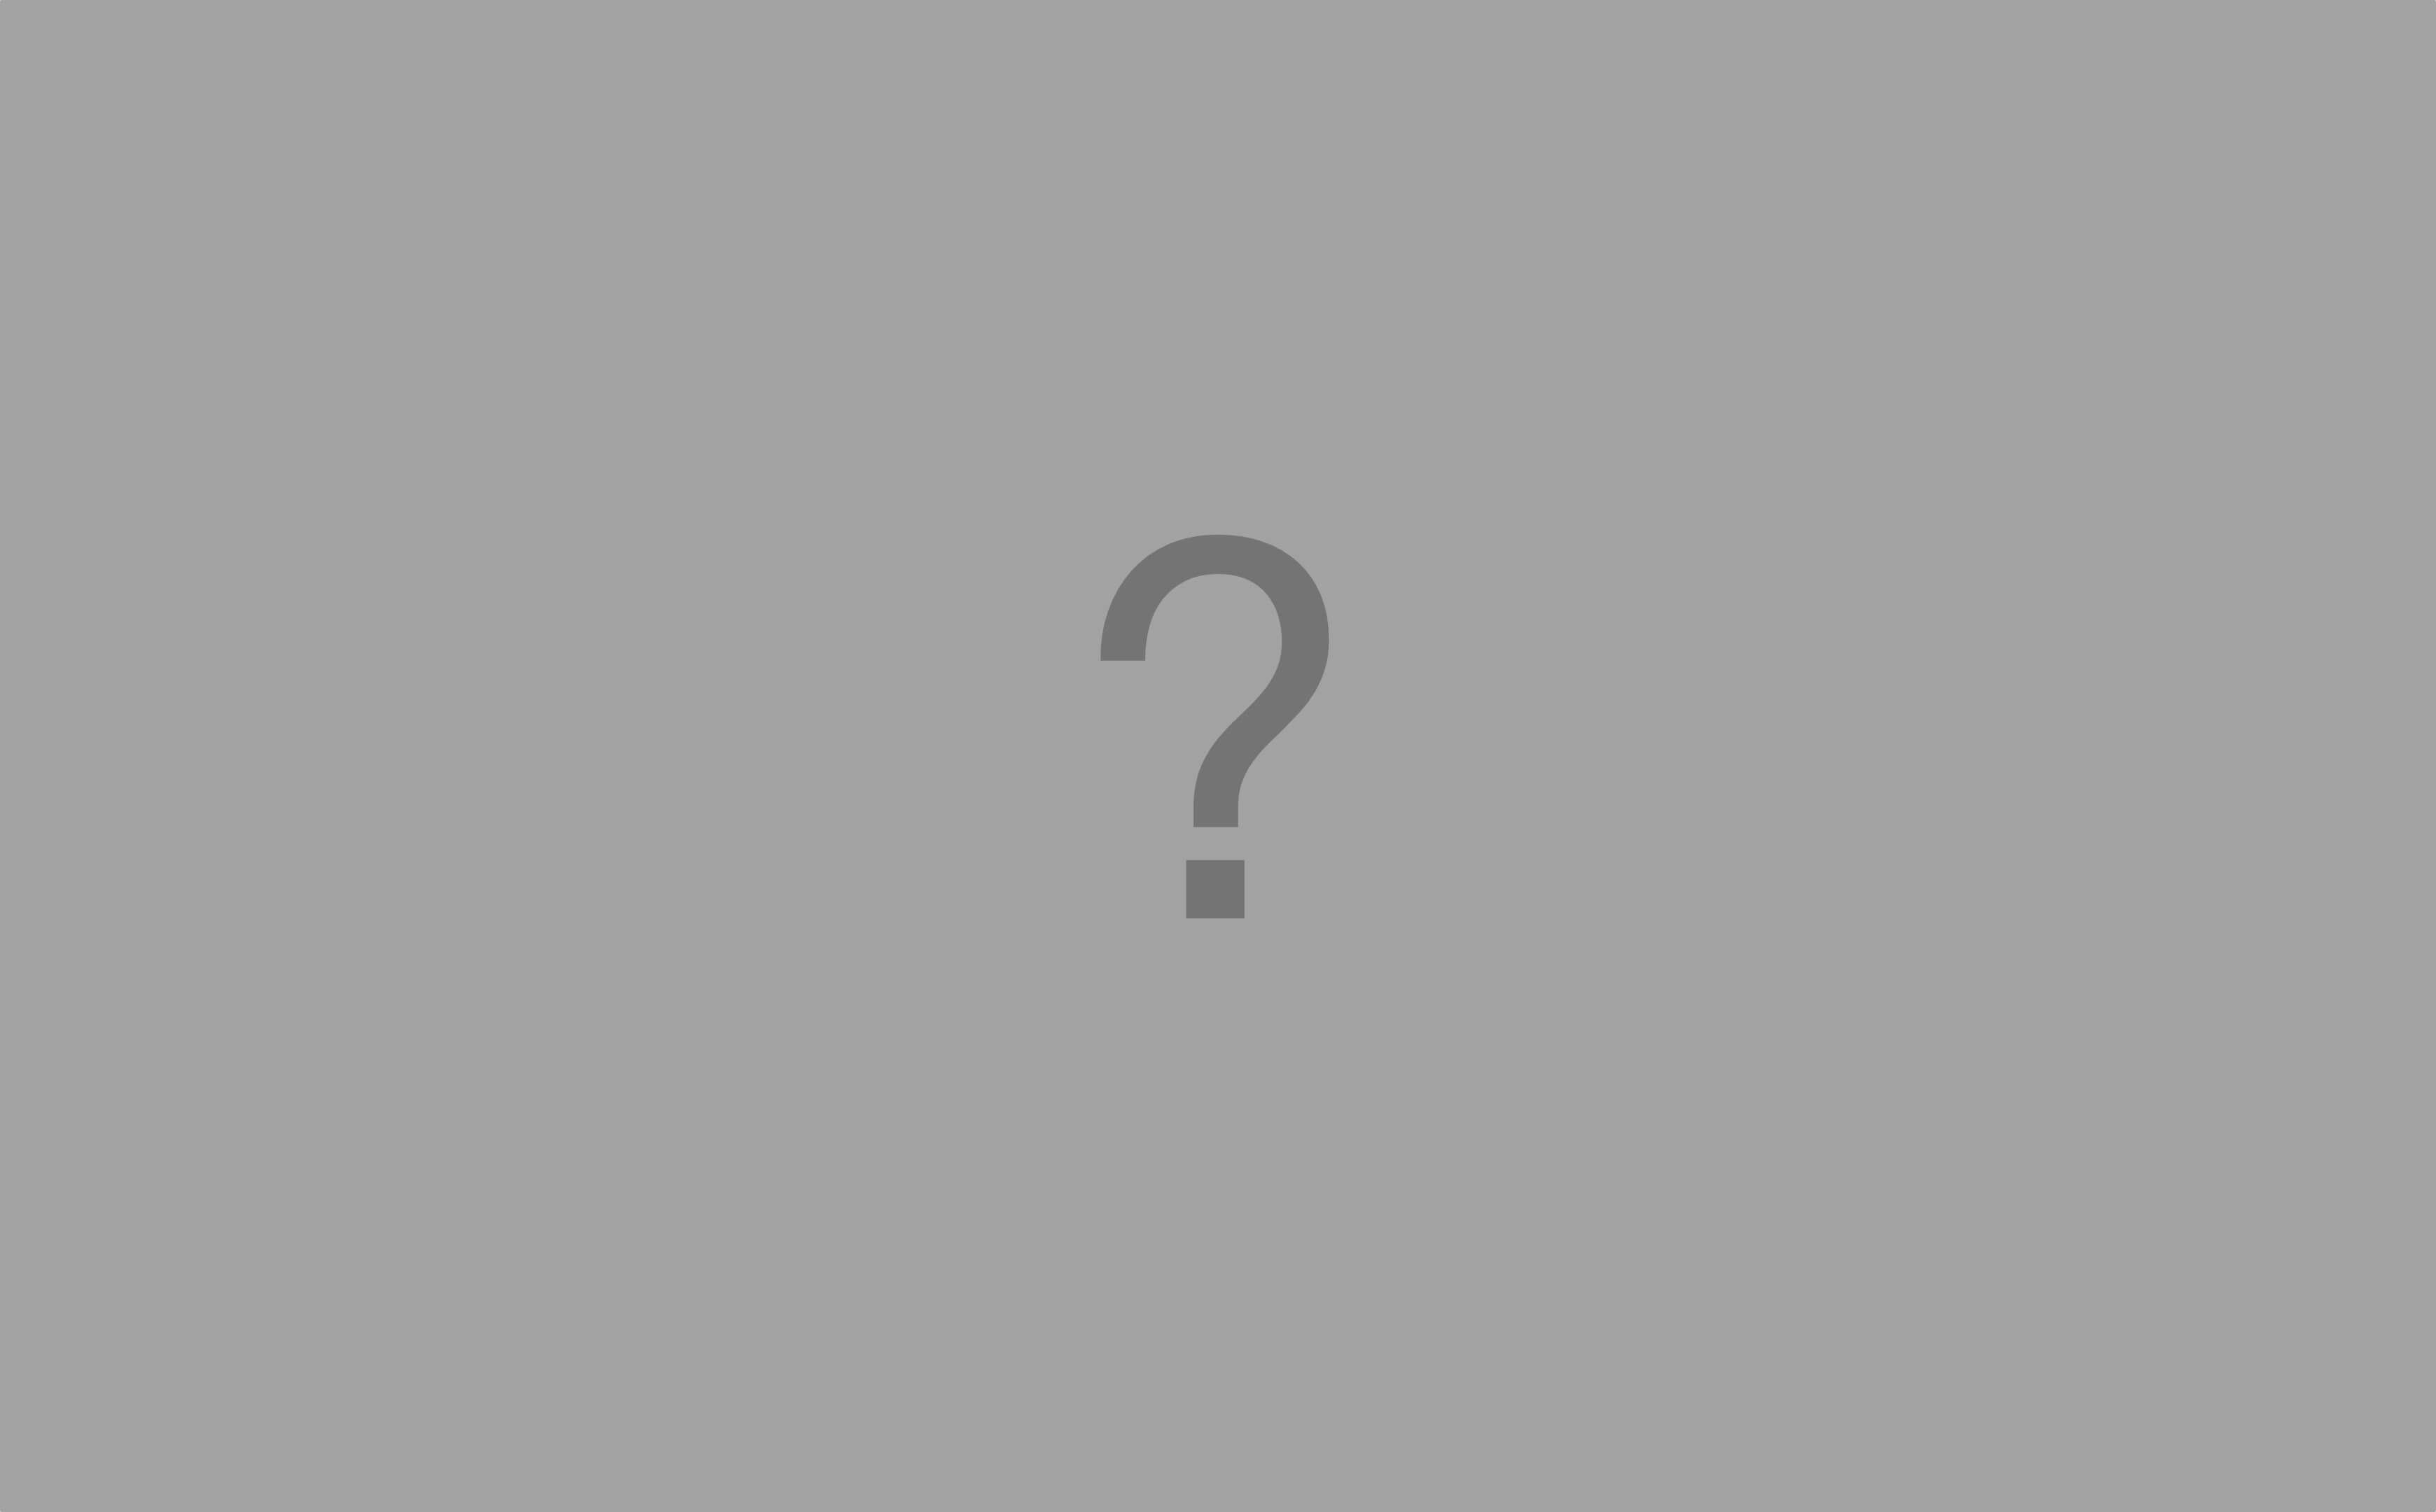 Apple iPhone 8: Touch ID laut TSMC-Quellen im Display